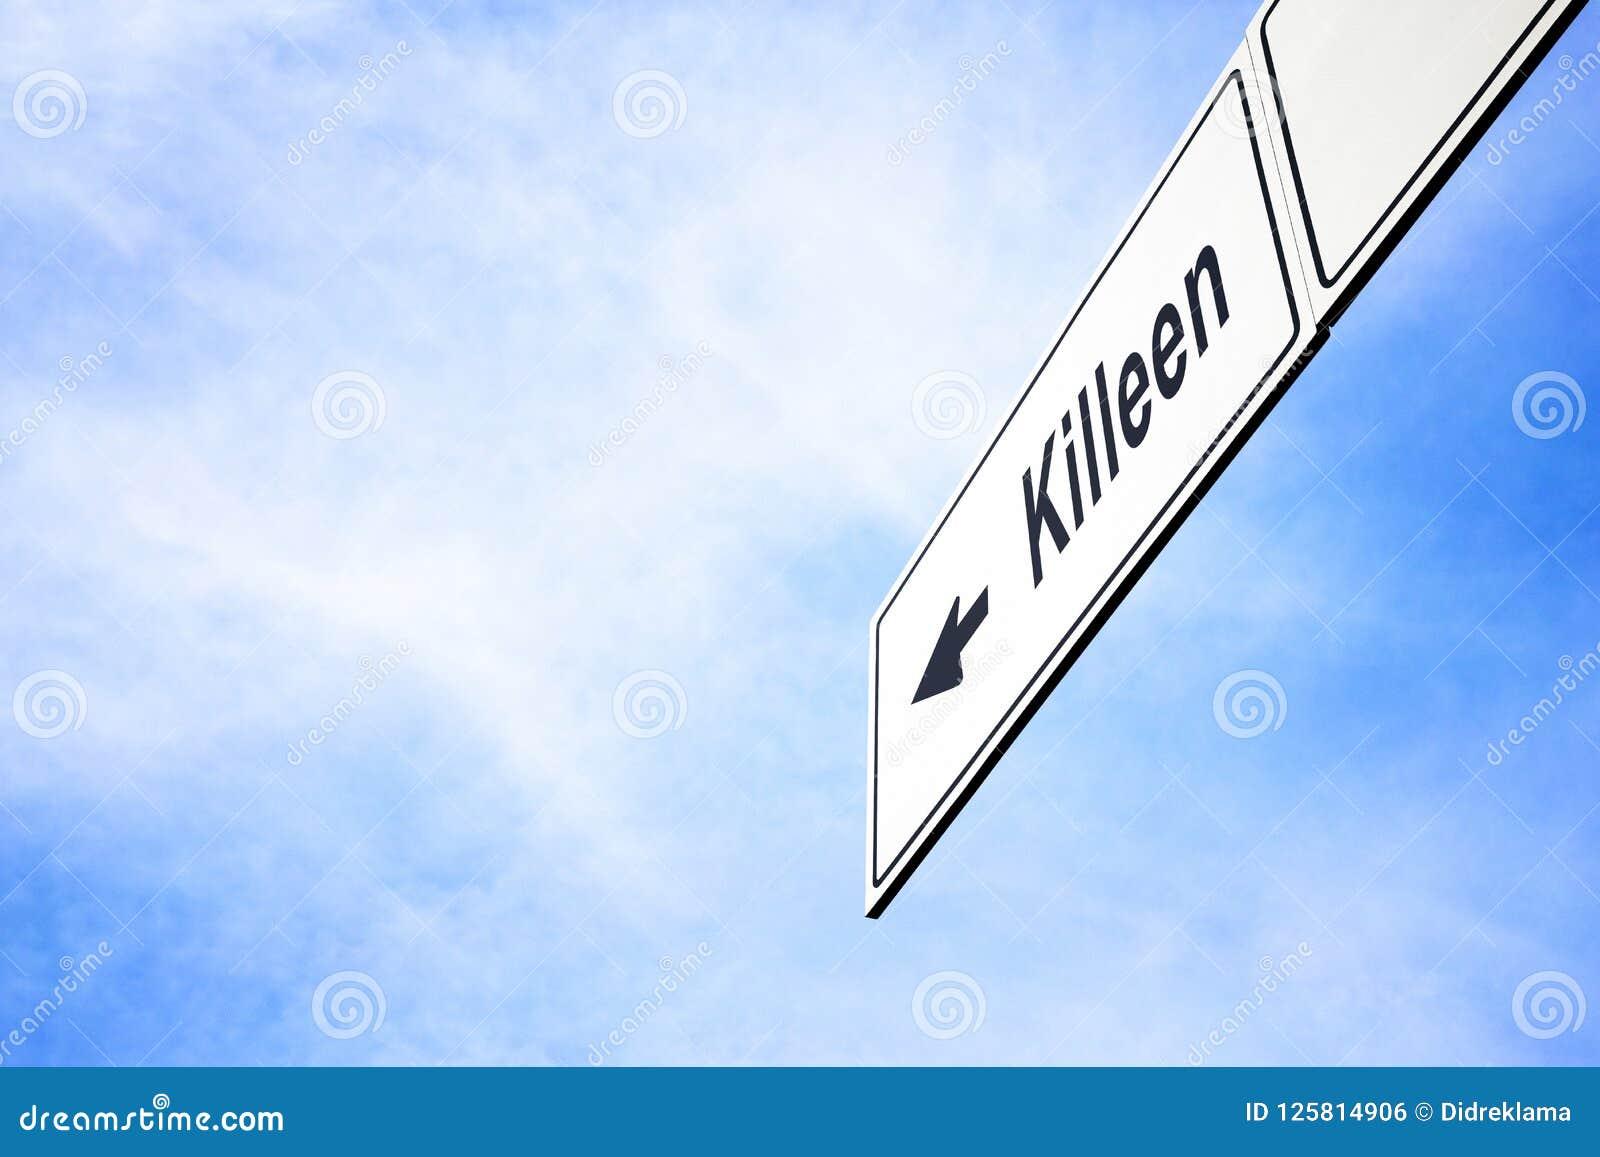 Signboard pointing towards Killeen